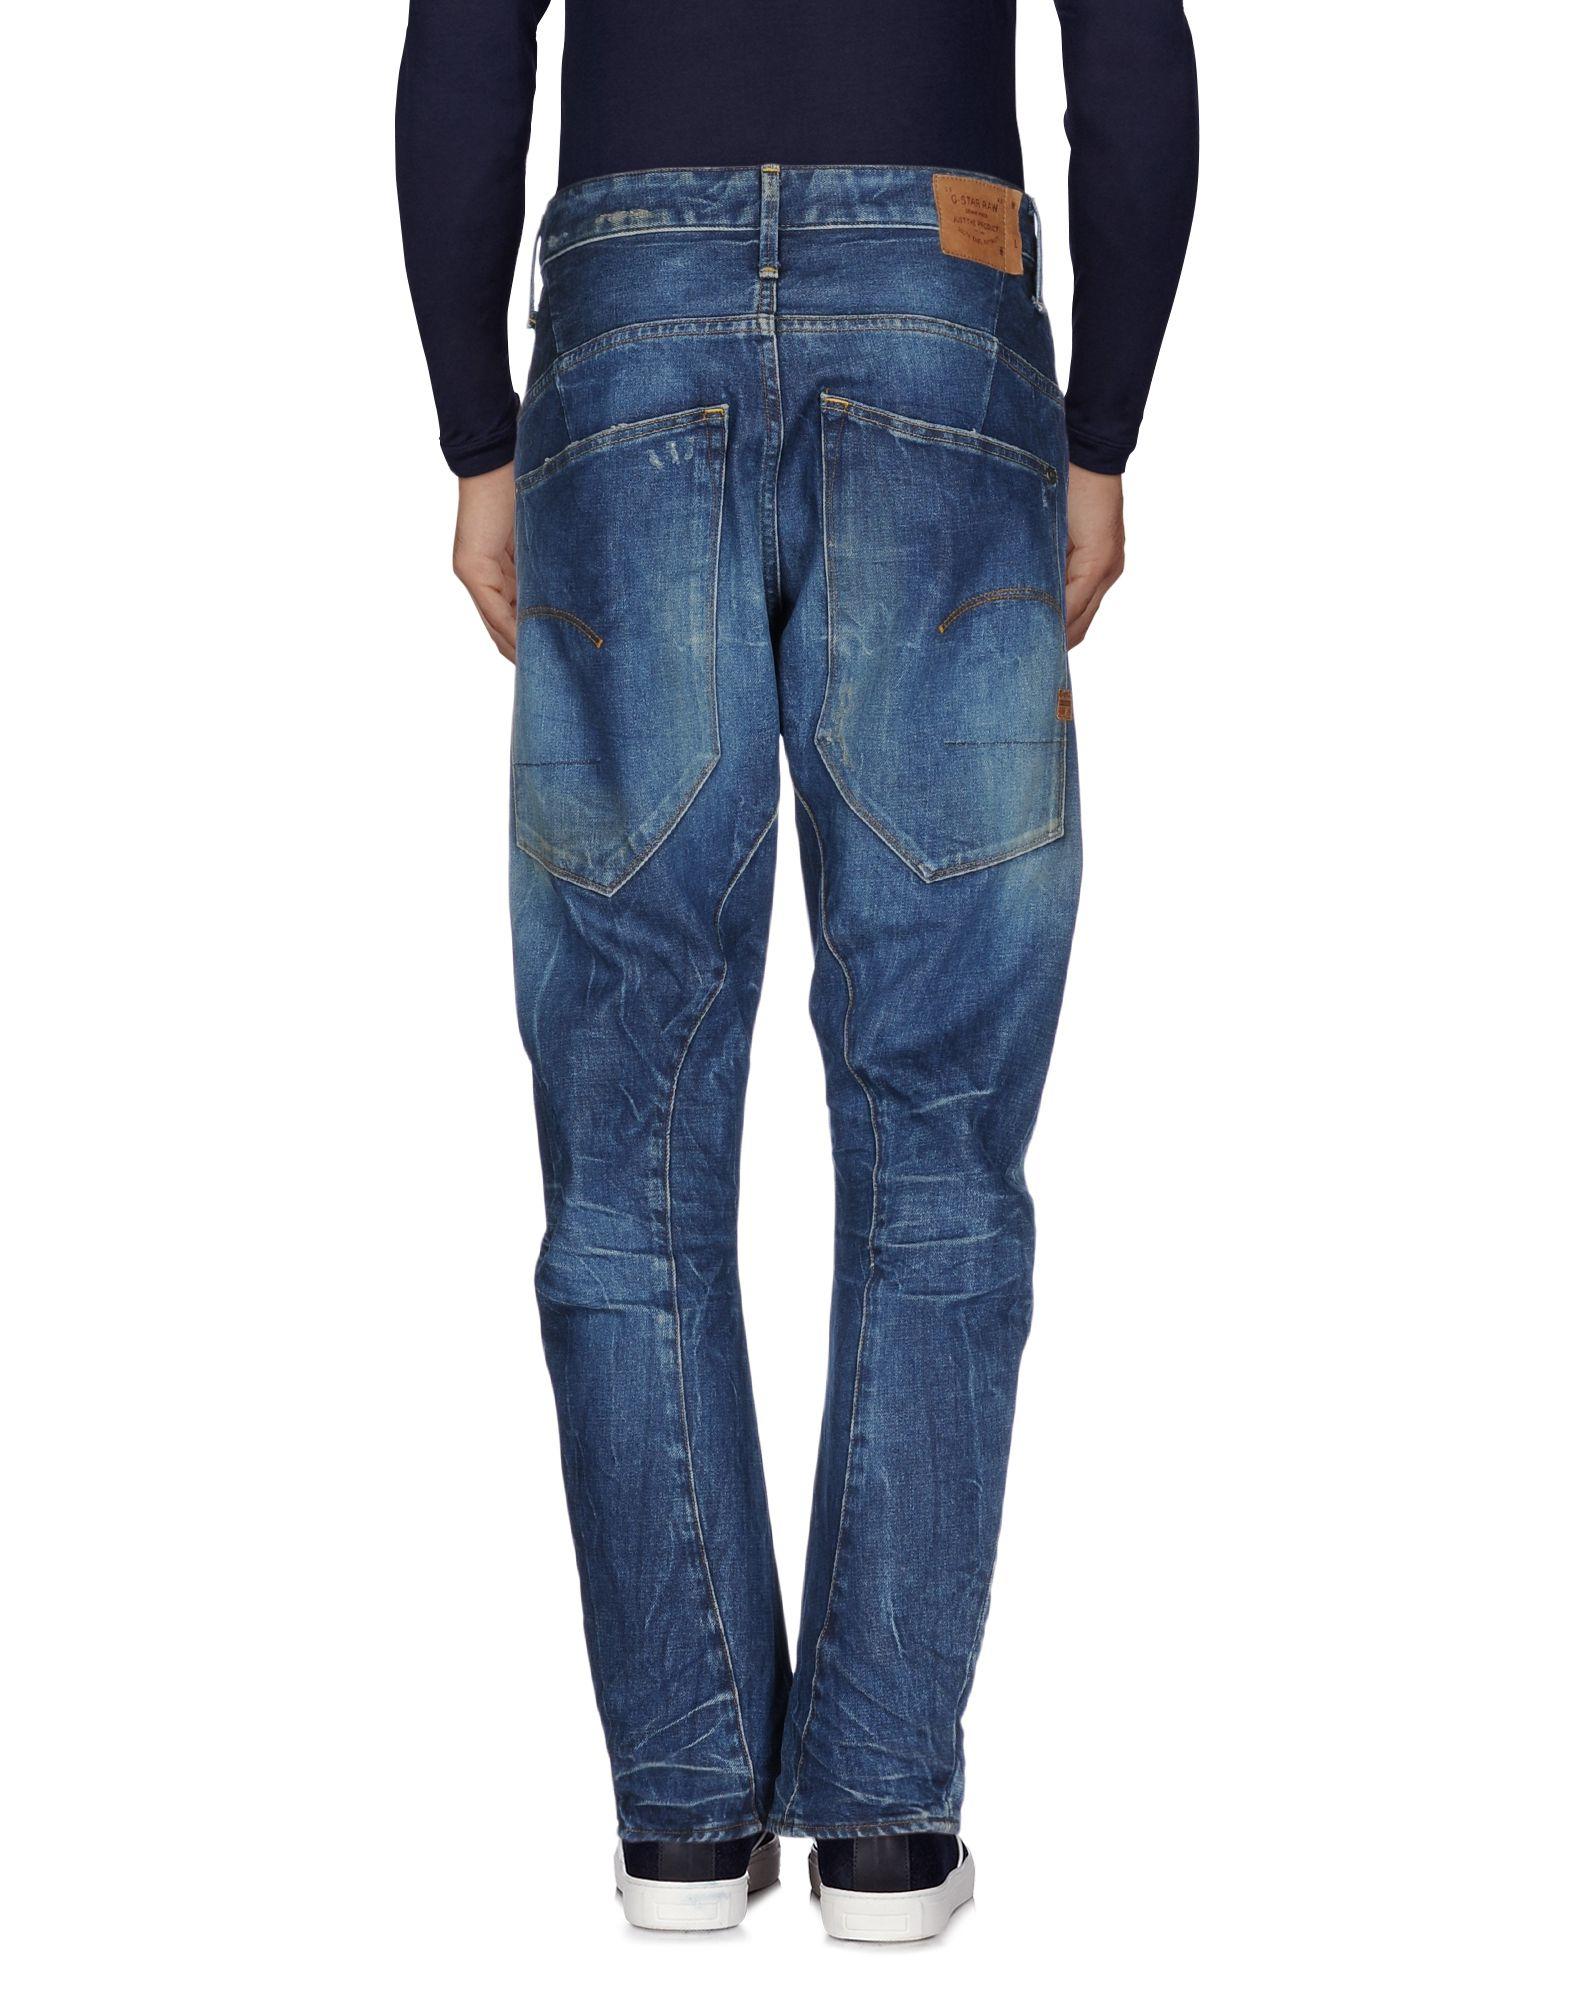 g star raw denim trousers in blue for men save 31 lyst. Black Bedroom Furniture Sets. Home Design Ideas